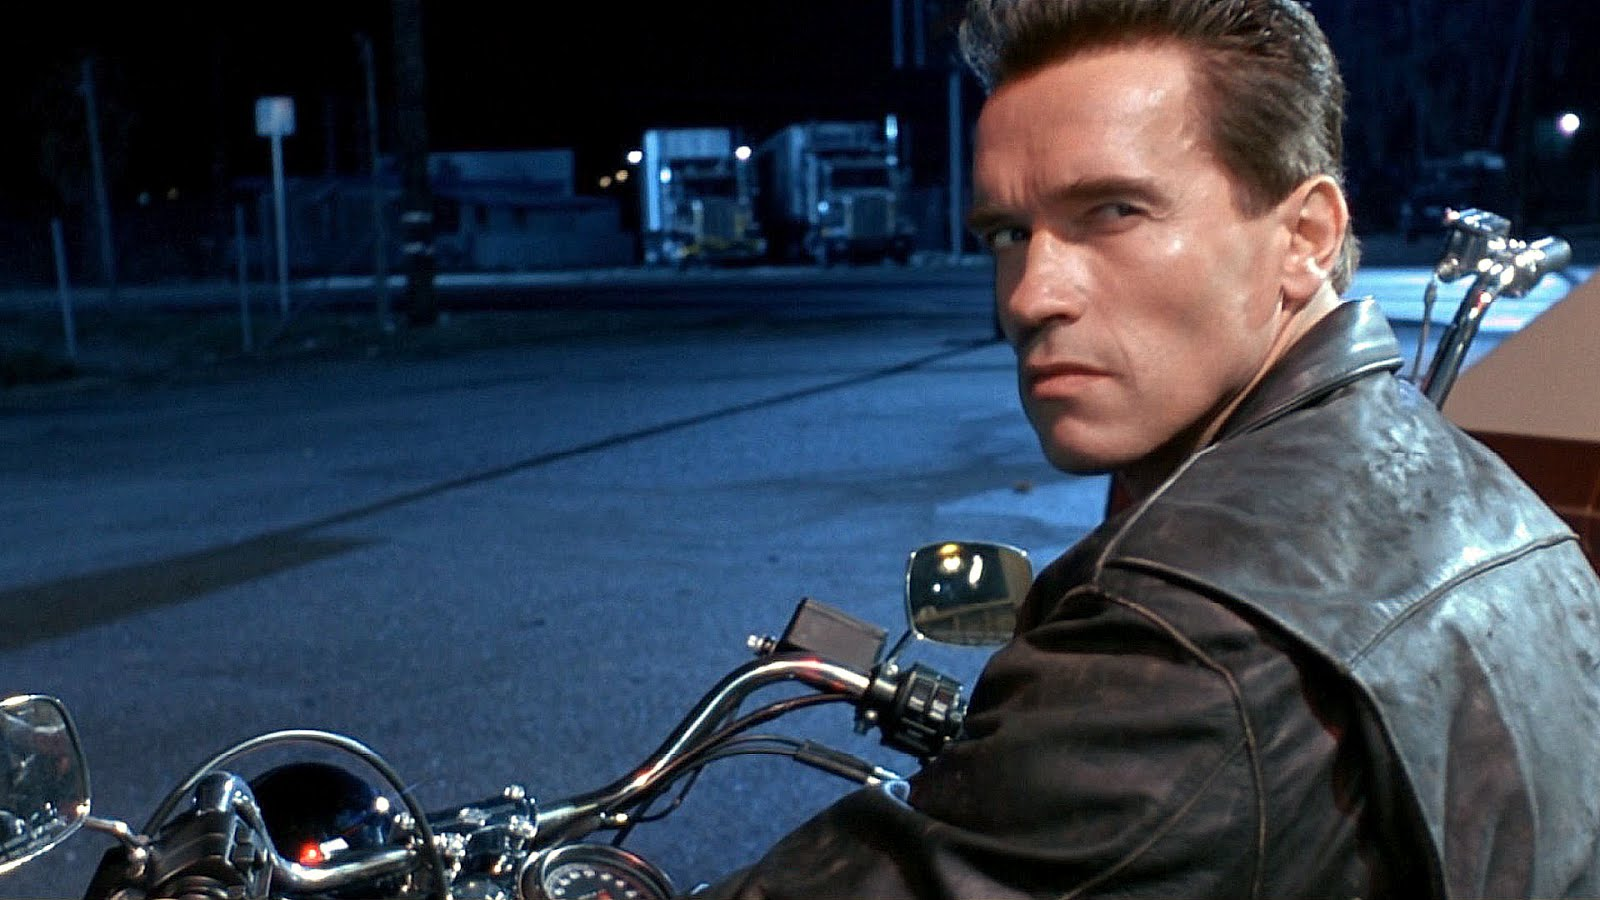 http://2.bp.blogspot.com/-tSNkl82qeHE/TzUm-1uX6DI/AAAAAAAAAS4/tpQDz8kGgHo/s1600/wallpaper-Terminator-movie.jpg